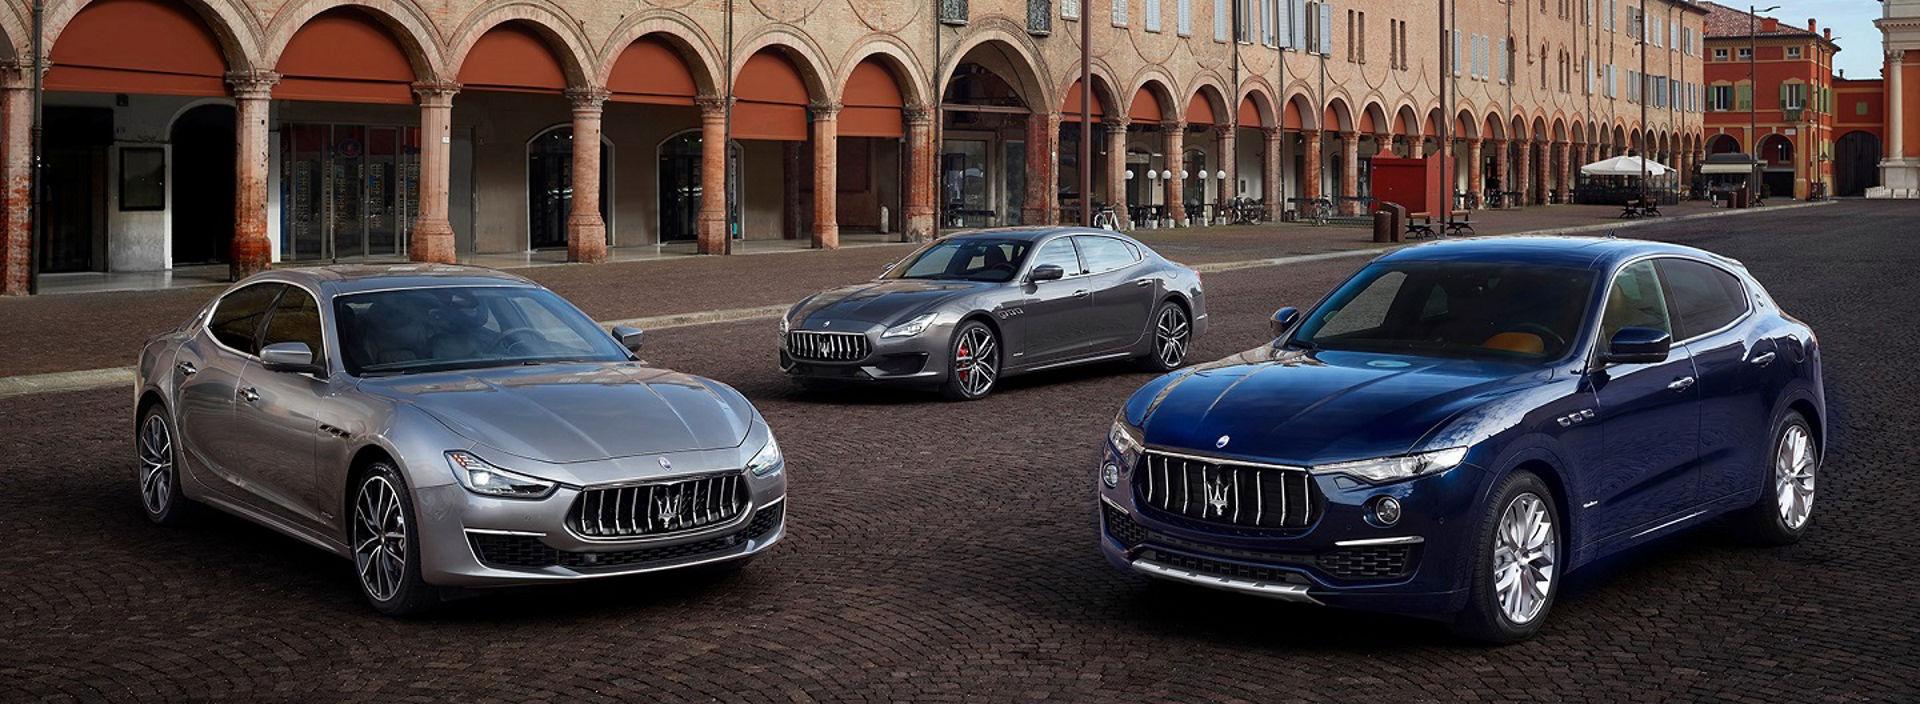 Maserati corporate sales range